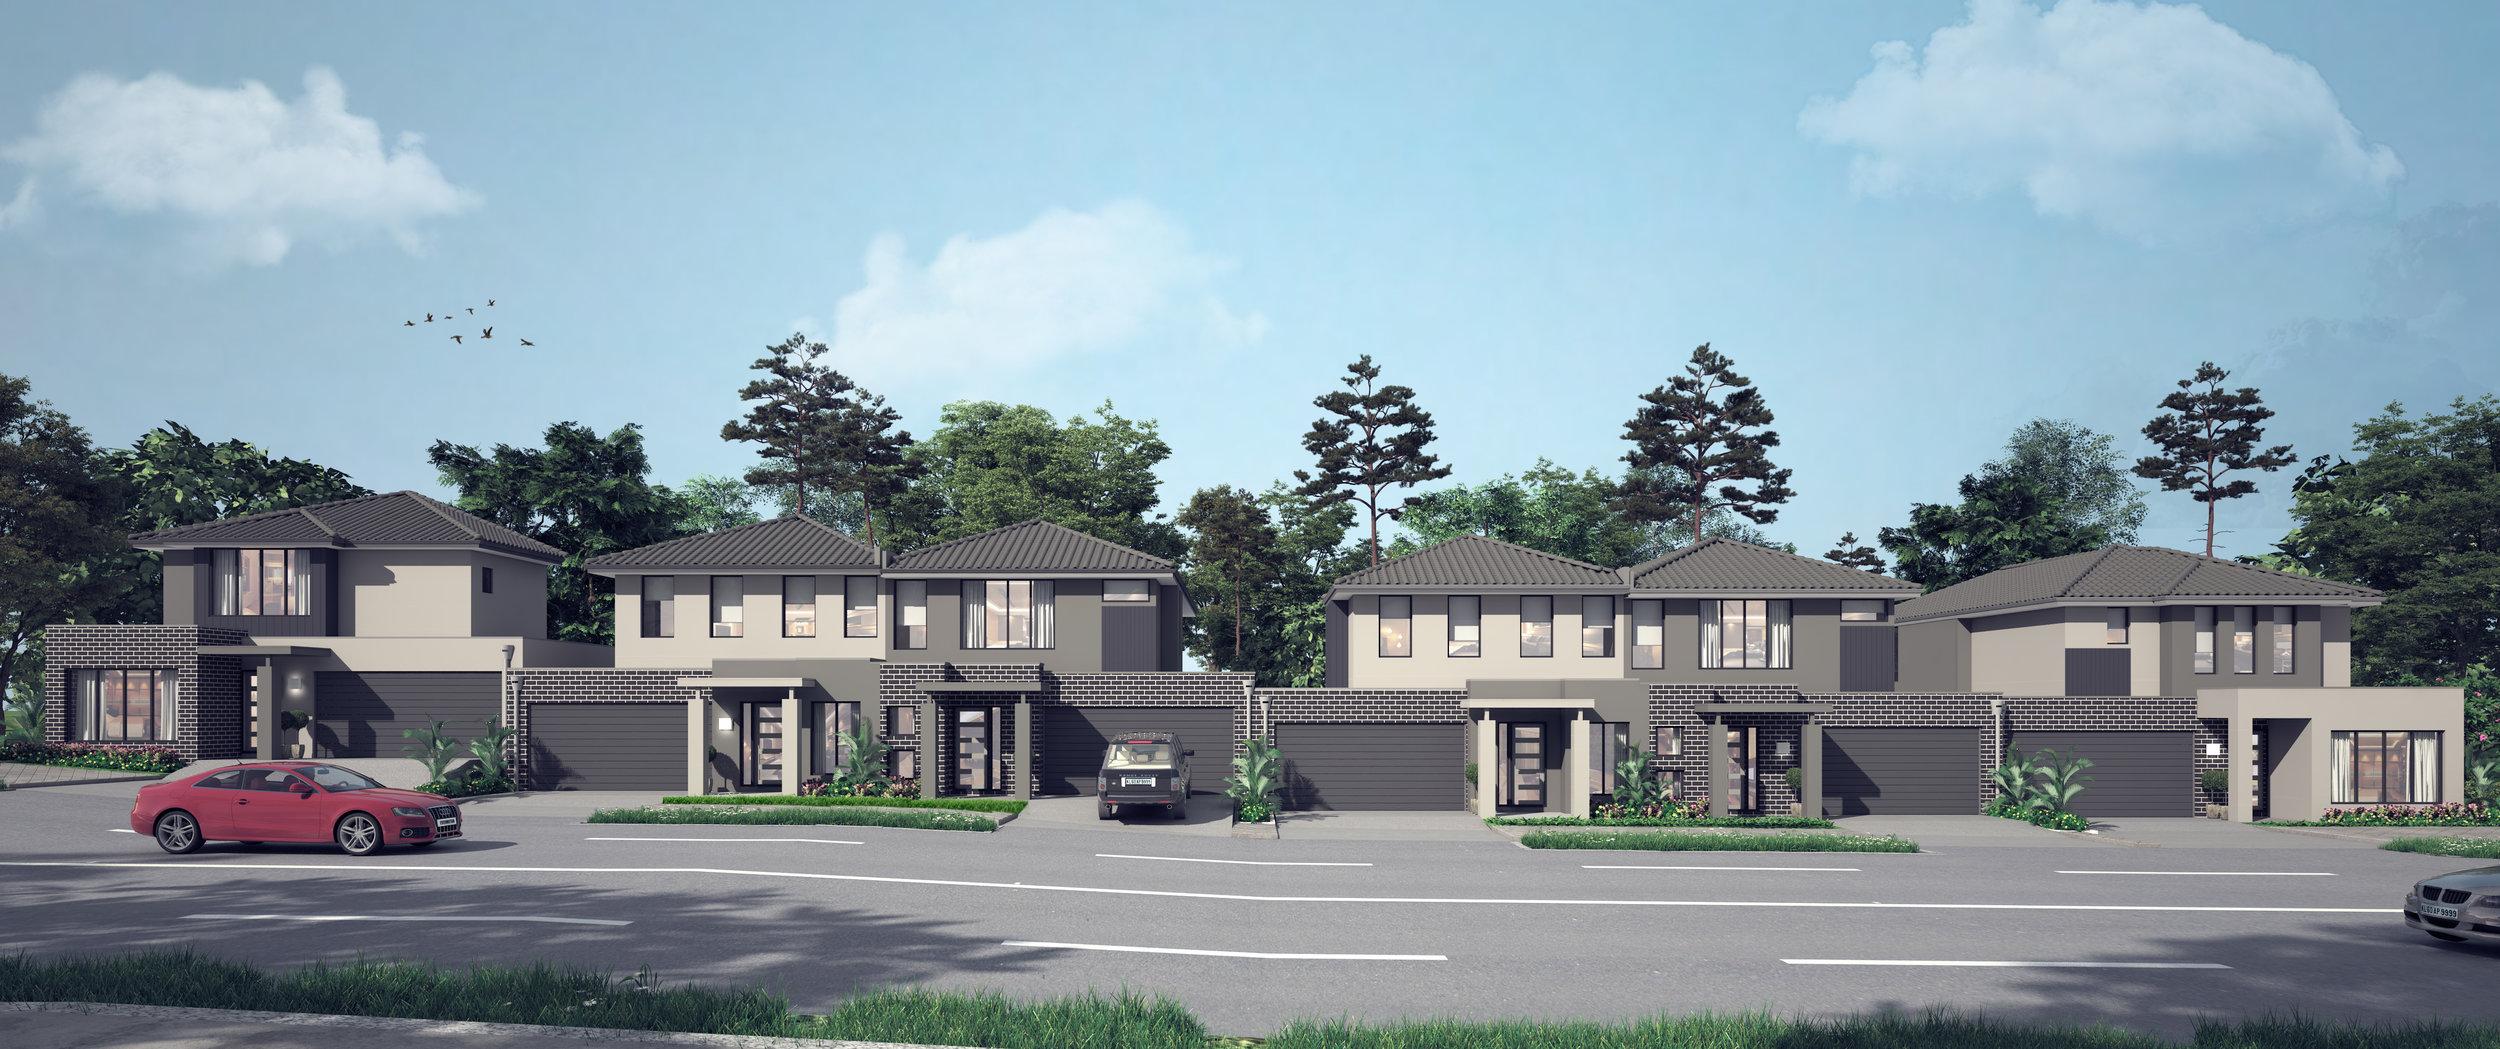 TOWNHOUSE - Lot 66